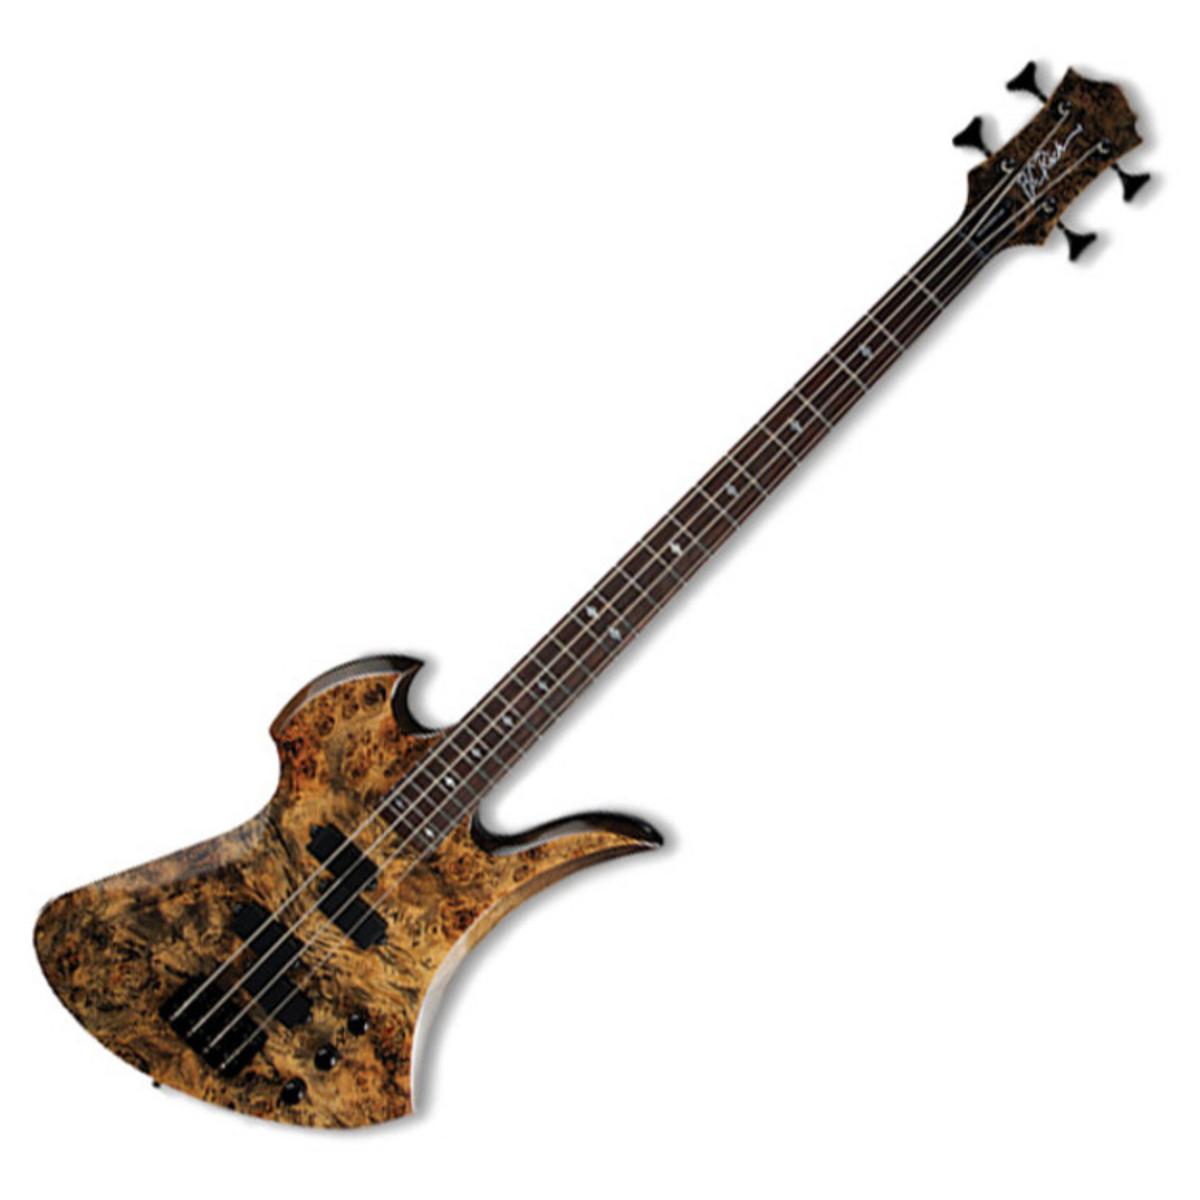 bc rich mockingbird plus bass guitar ghost black b stock at. Black Bedroom Furniture Sets. Home Design Ideas